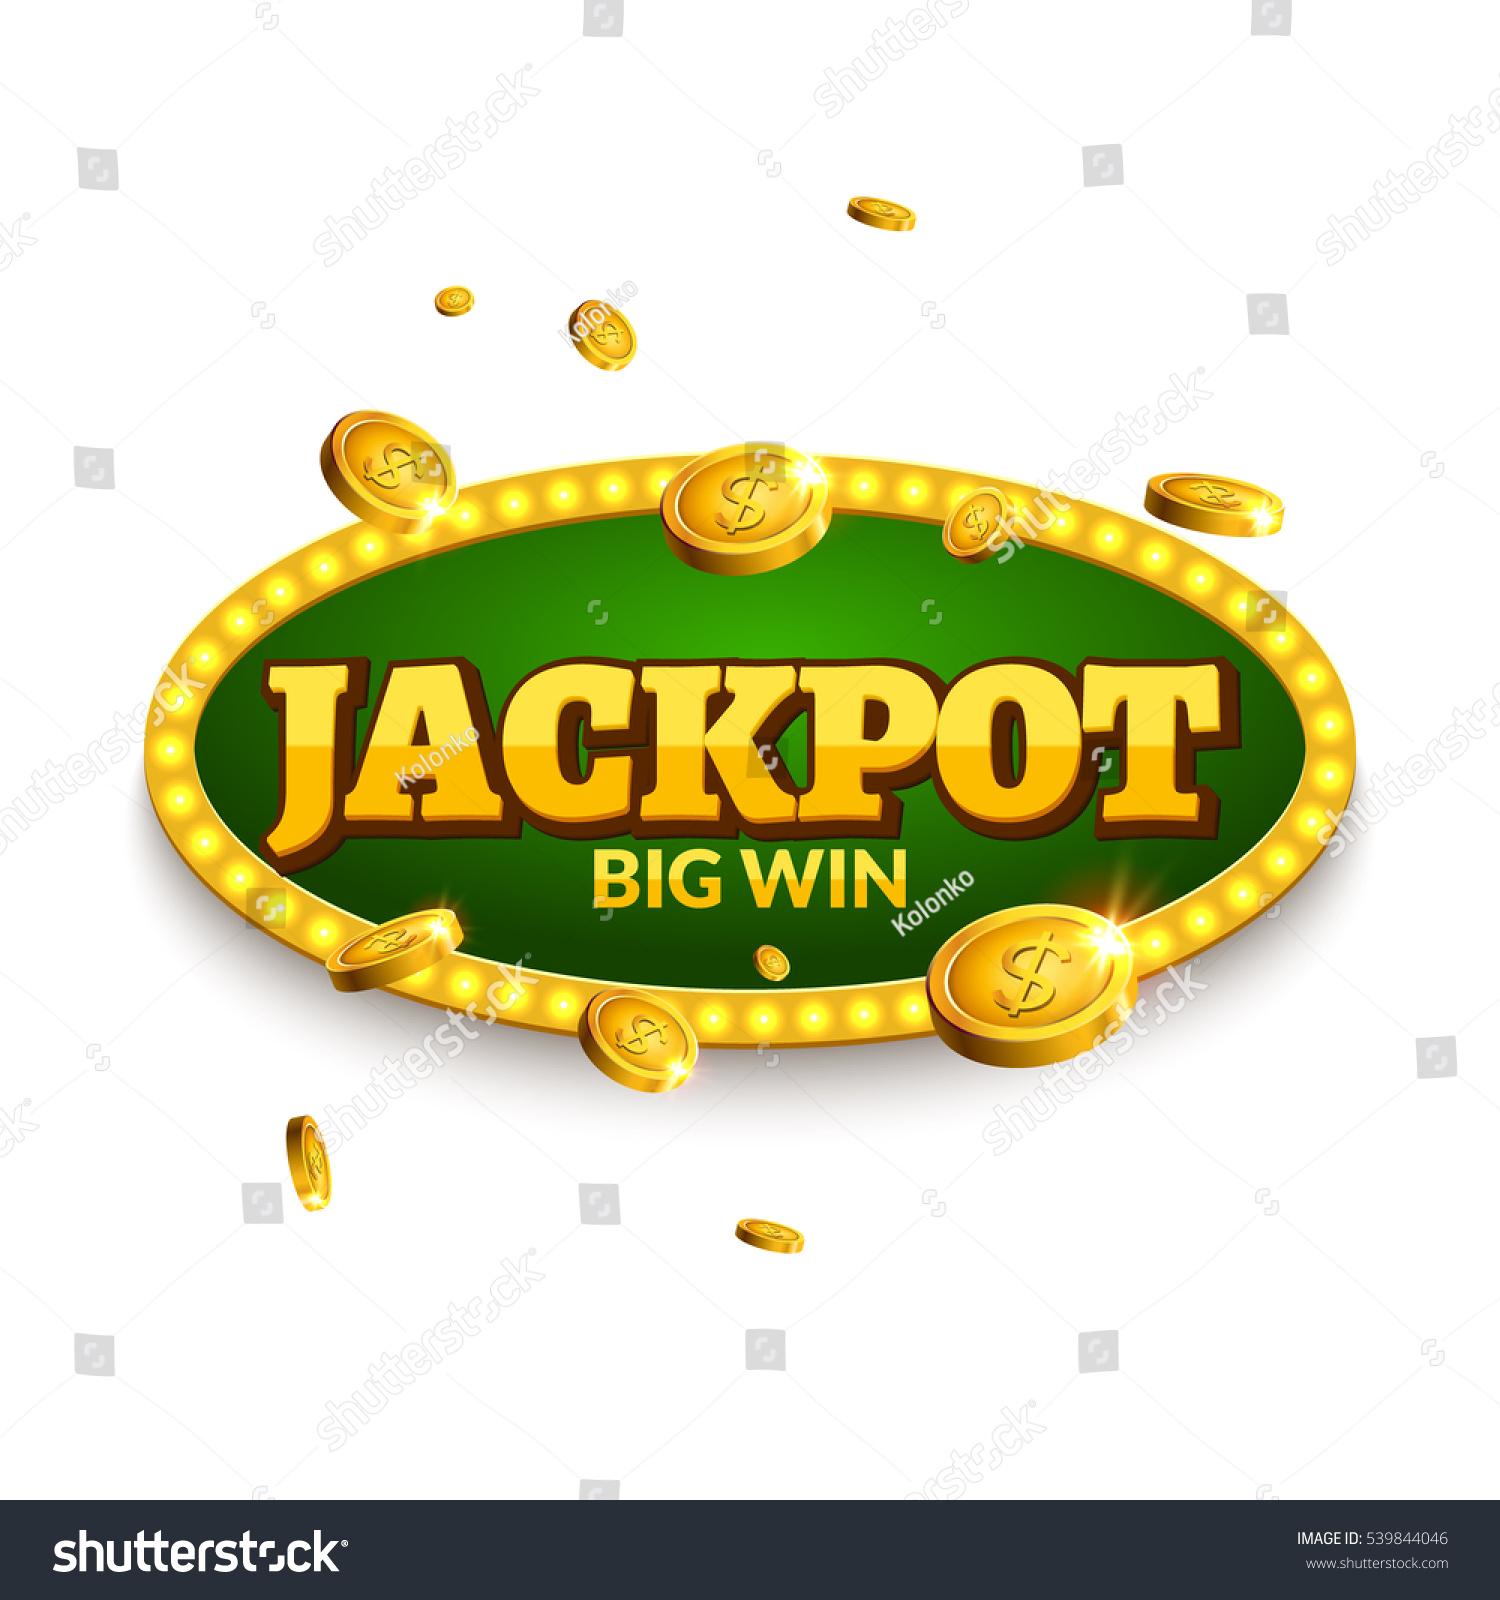 Create gambling logo